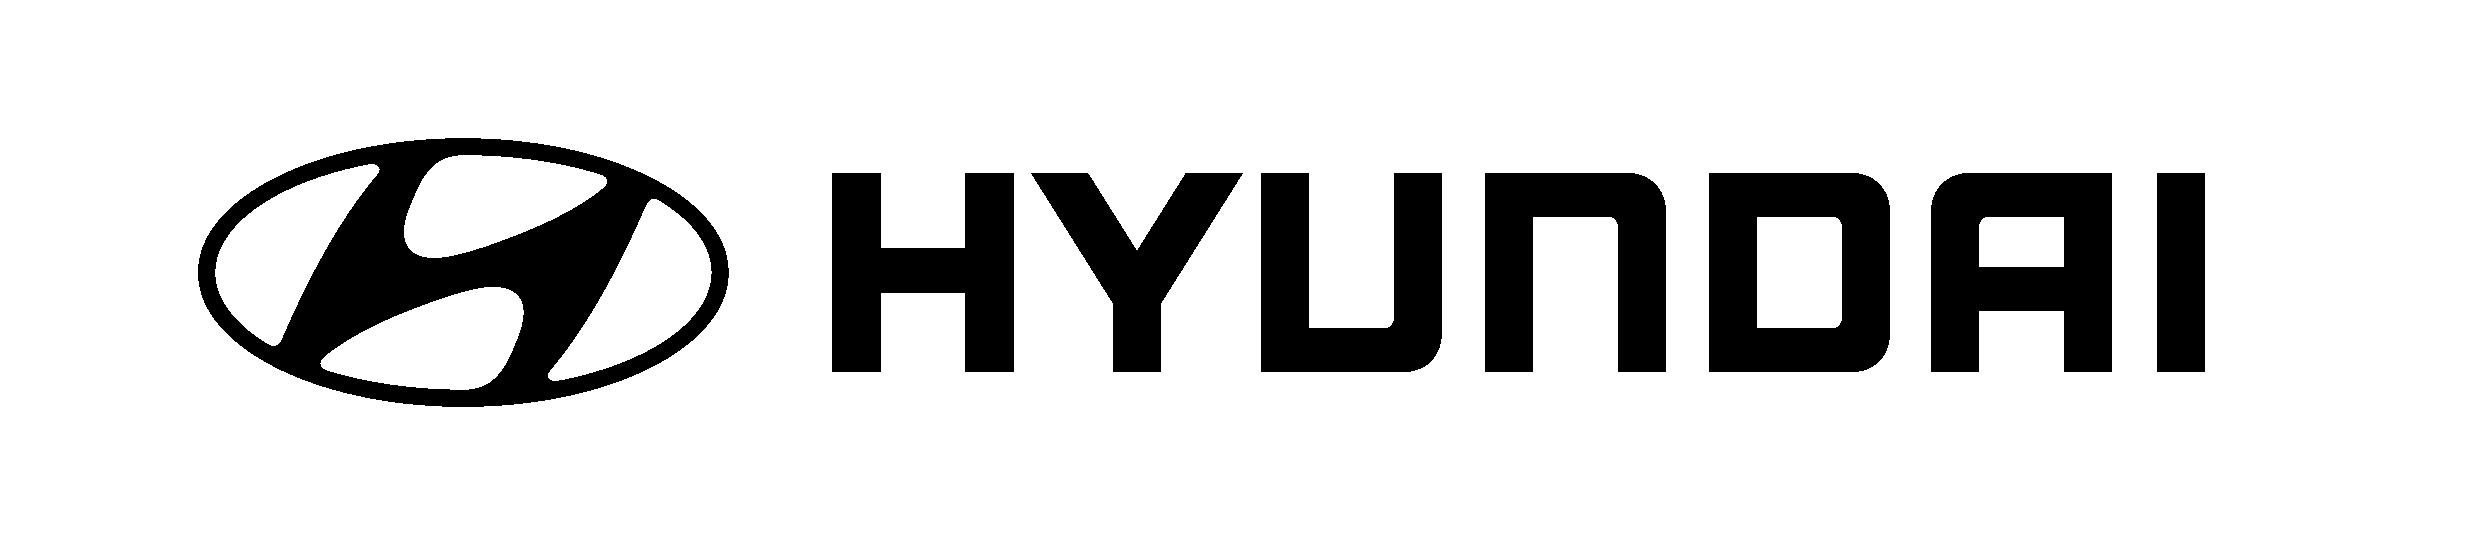 Hyundai logo - black-01.png